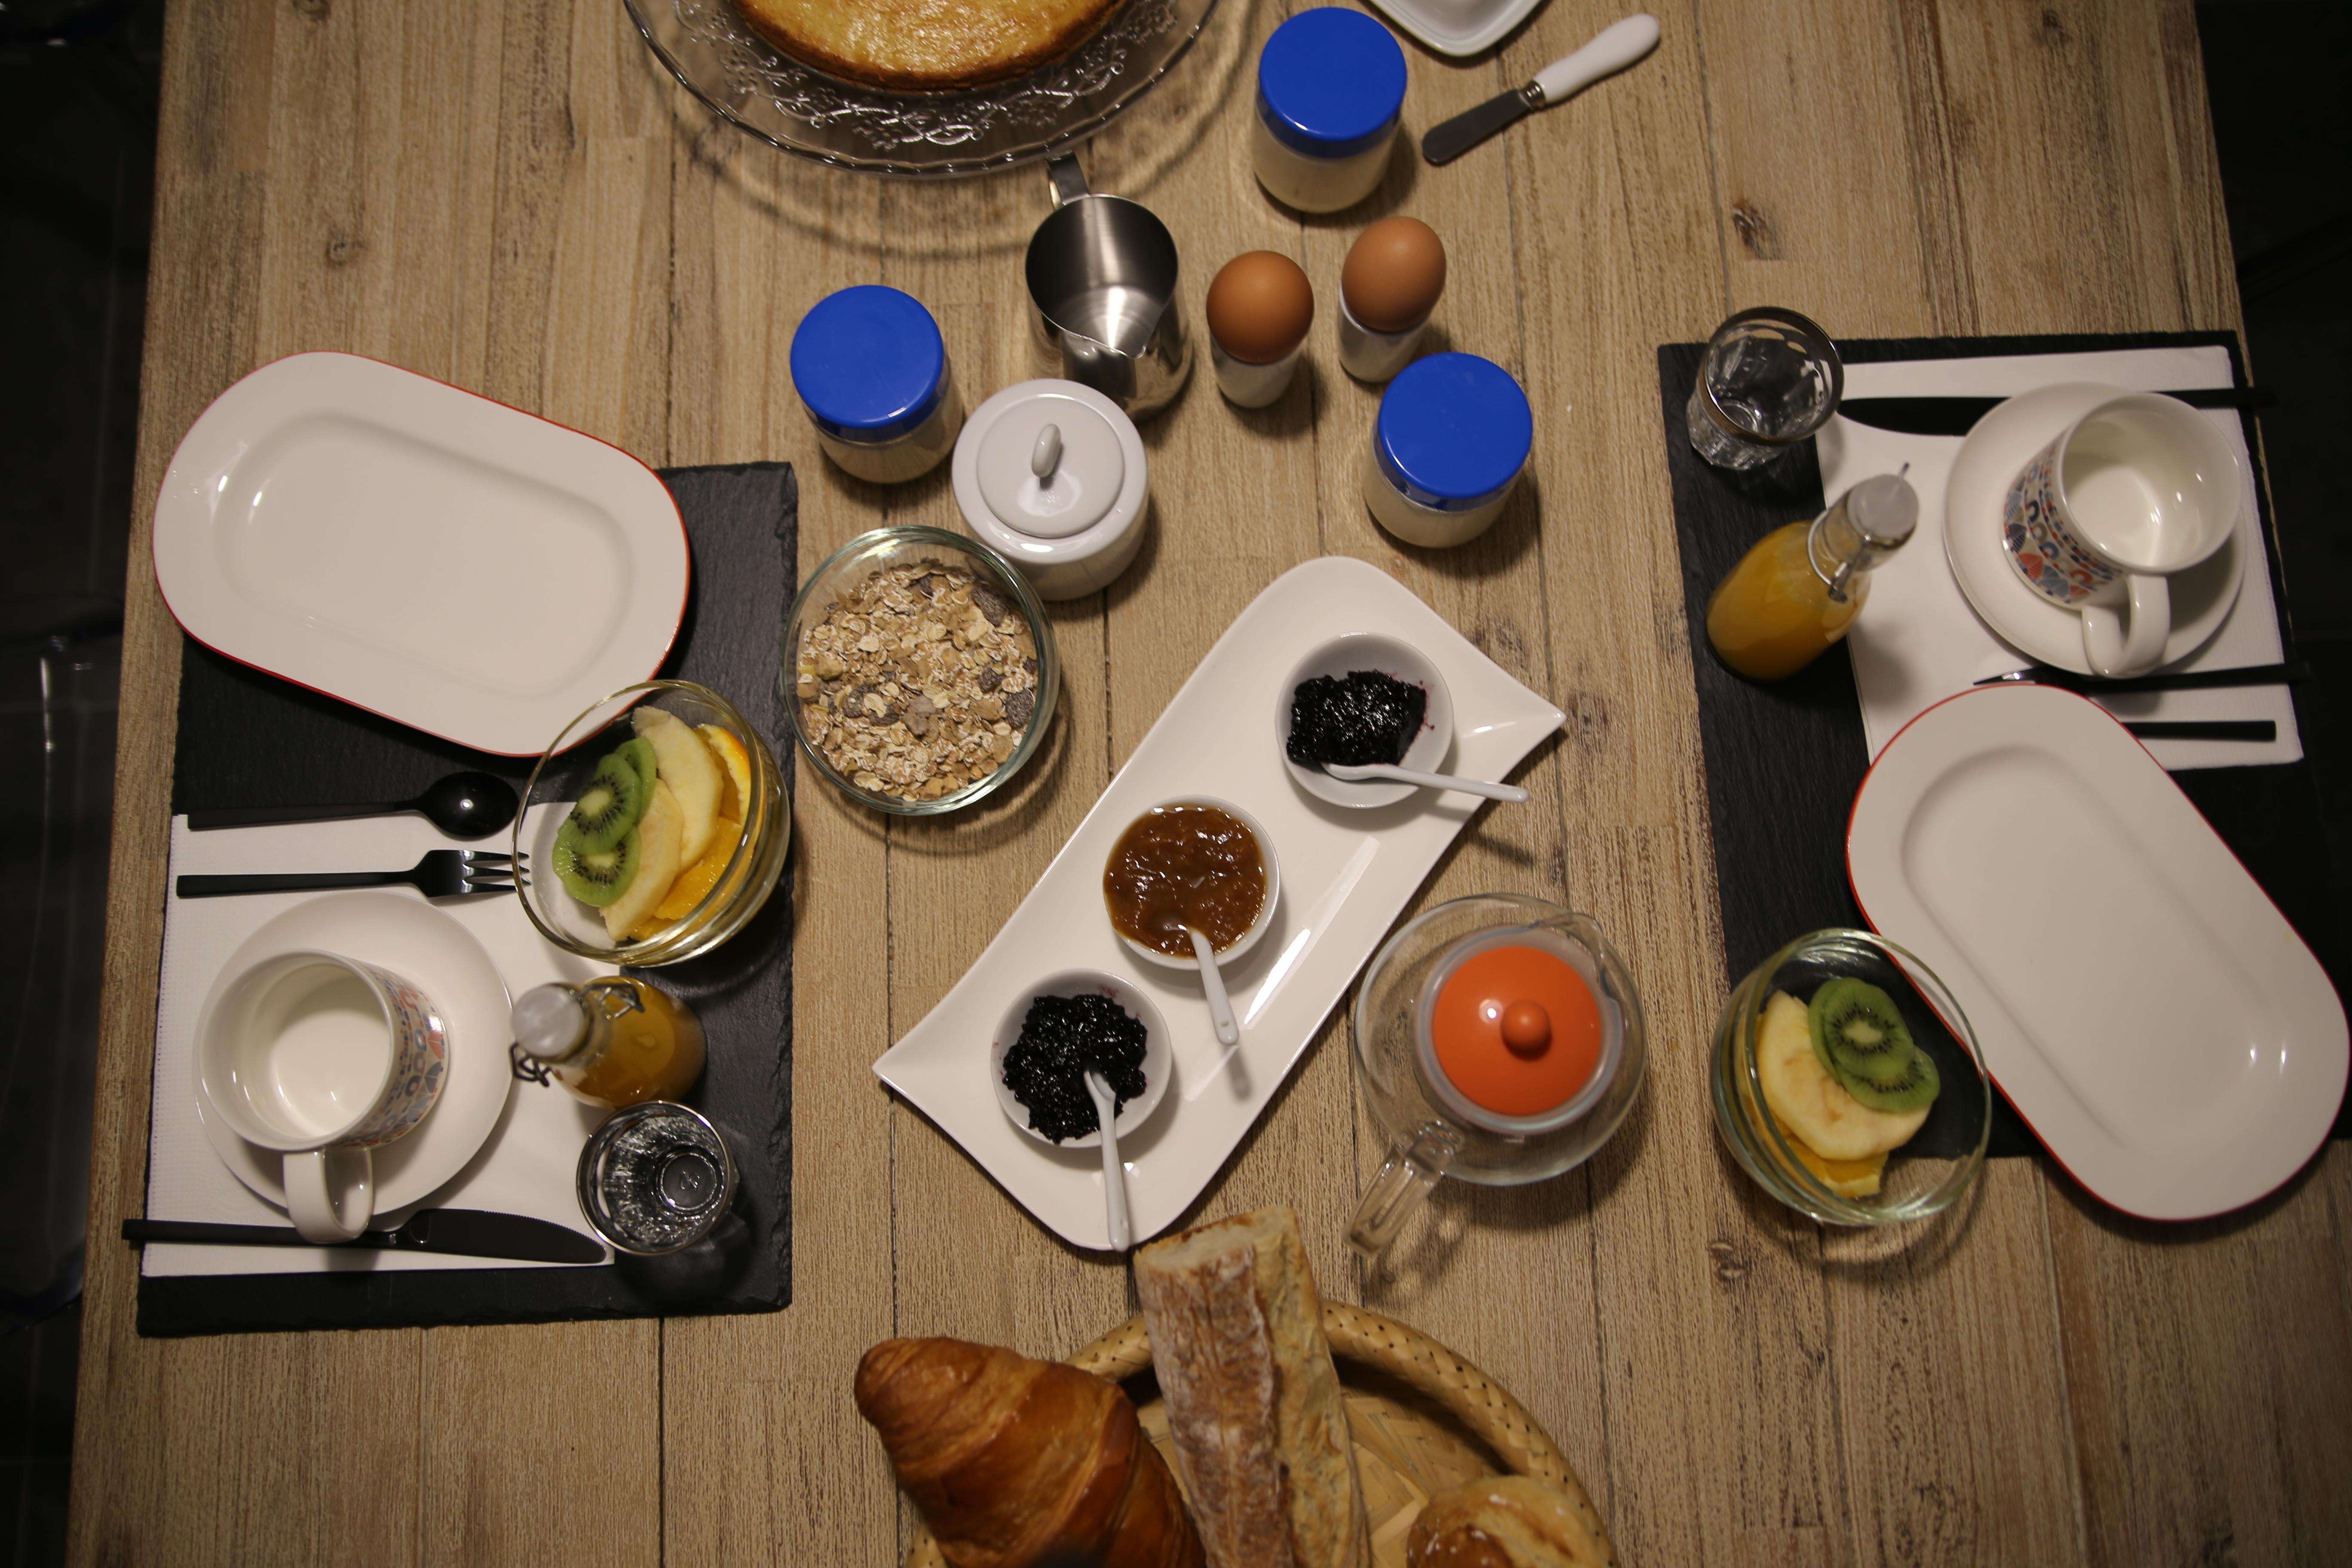 côté pinède petit dejeuner 8